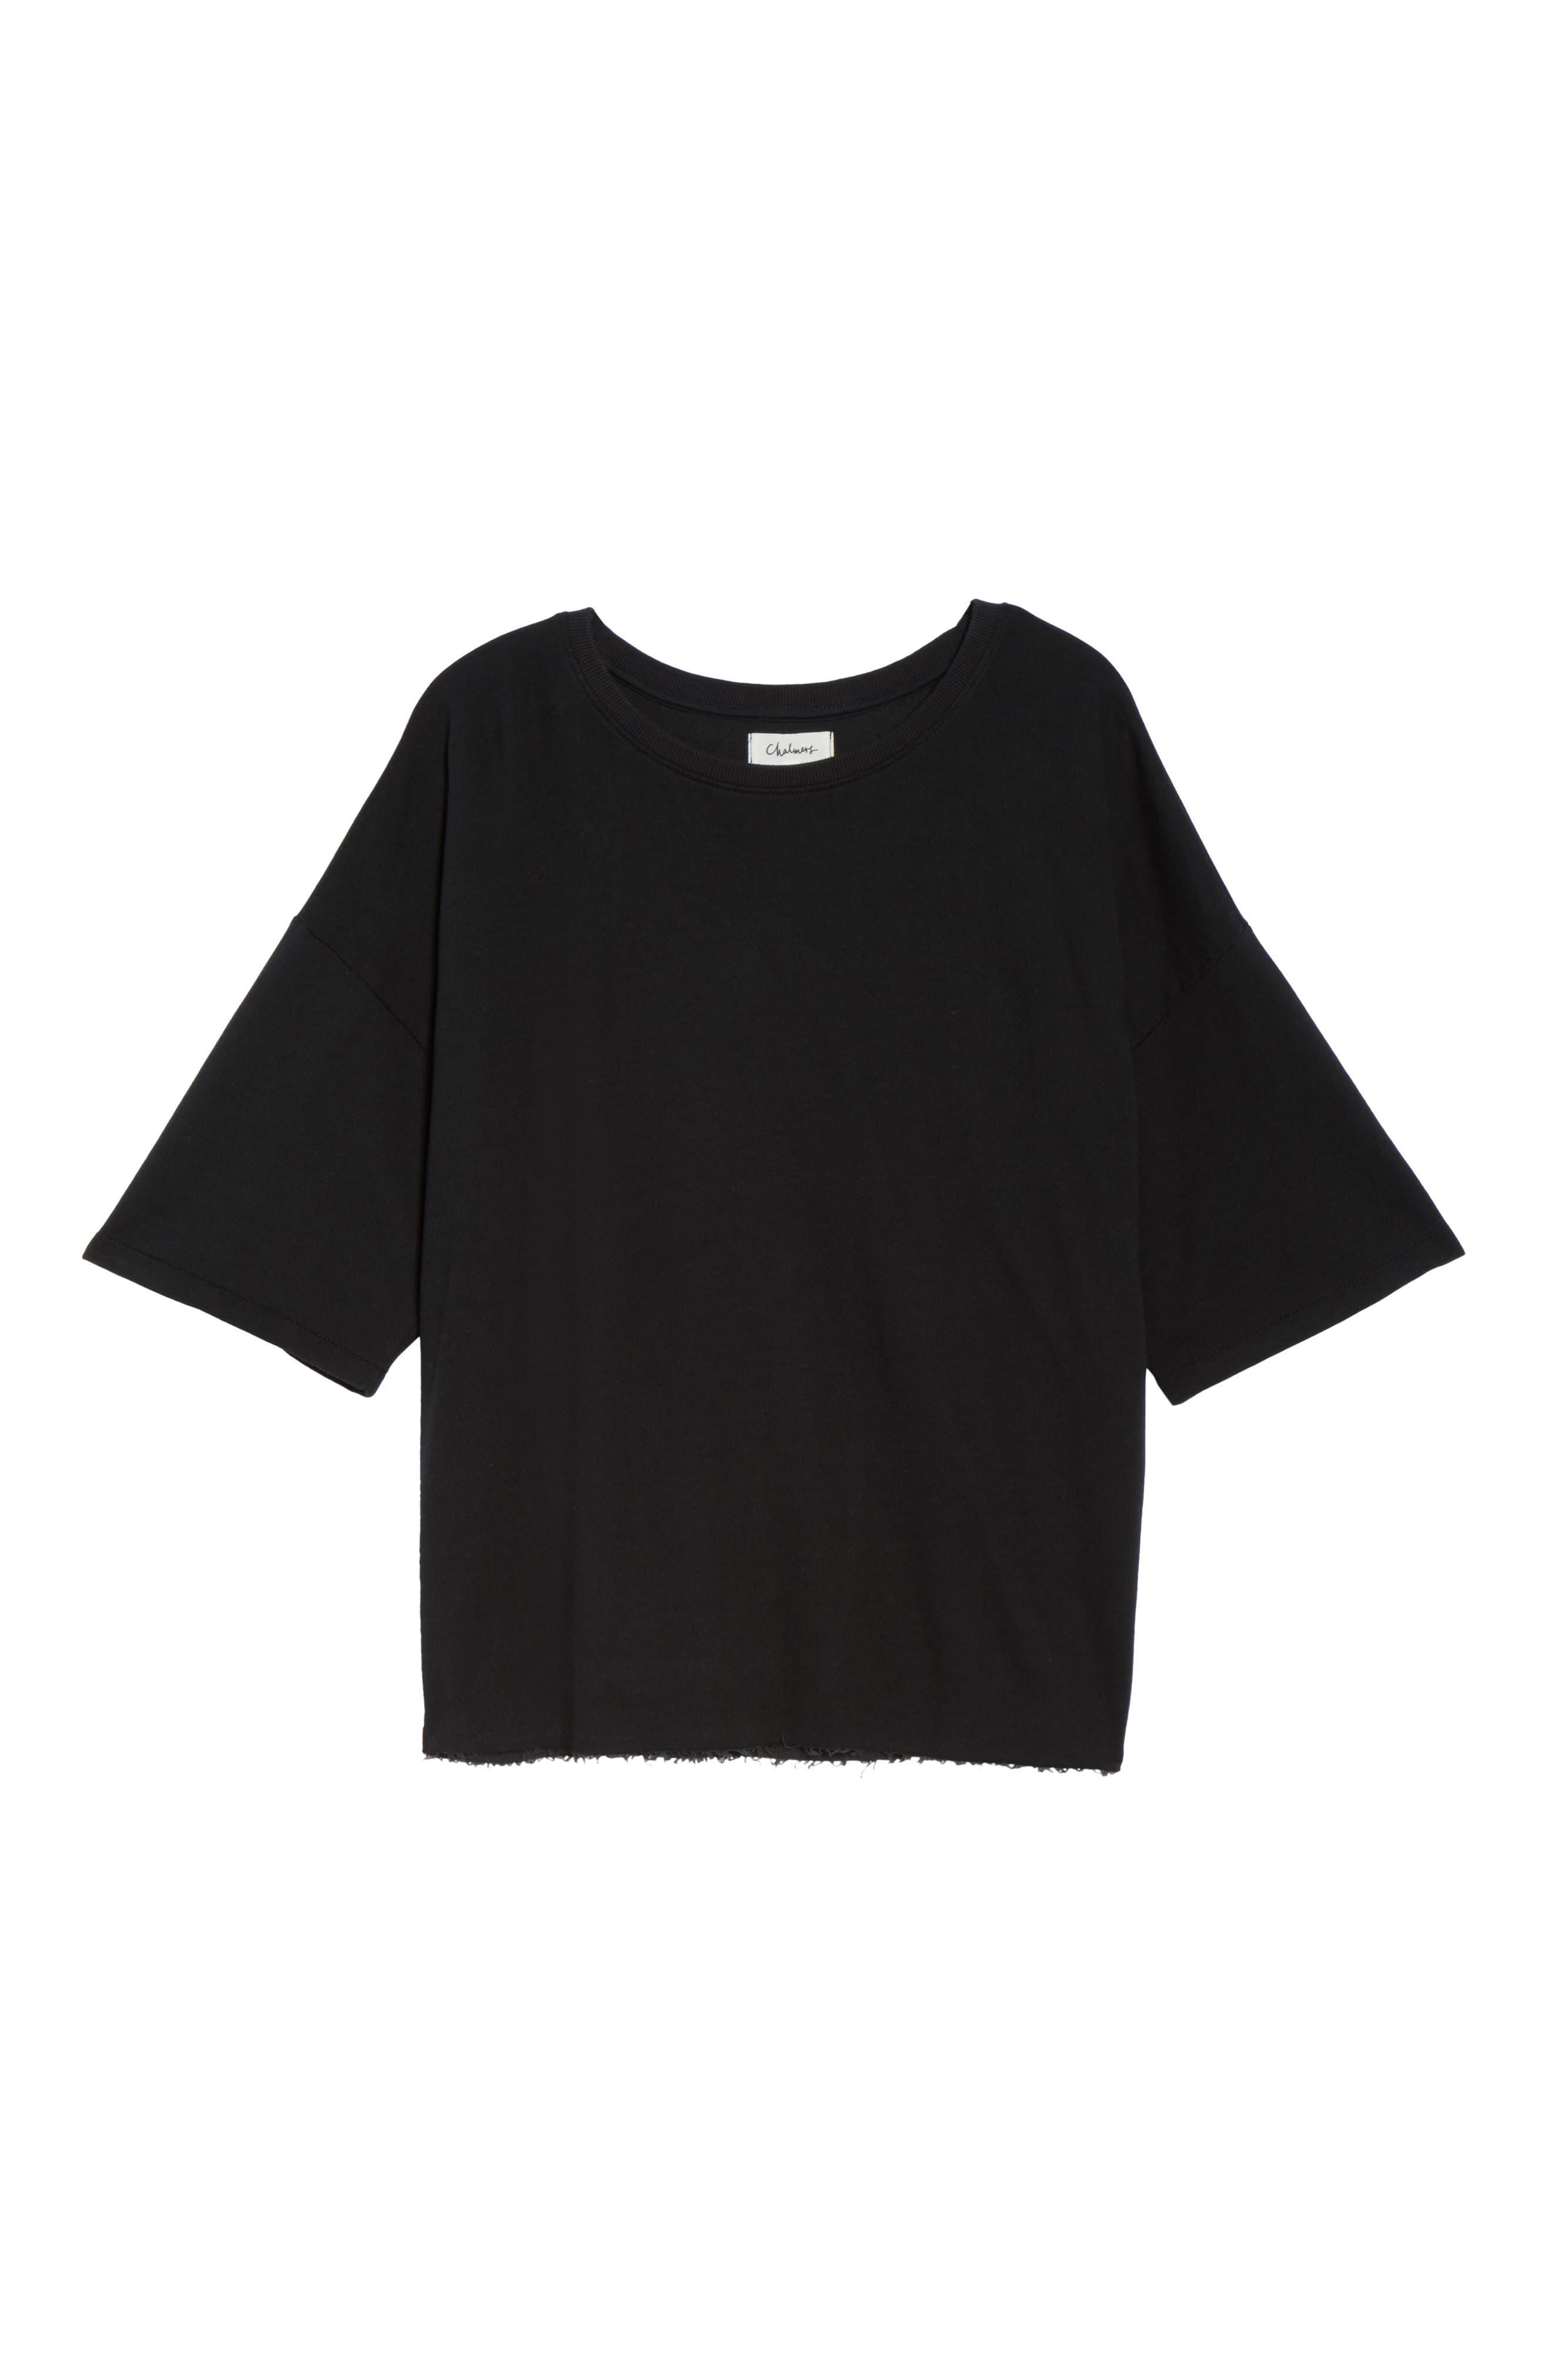 Soph Lounge Sweater,                             Alternate thumbnail 5, color,                             Plain Black Marle